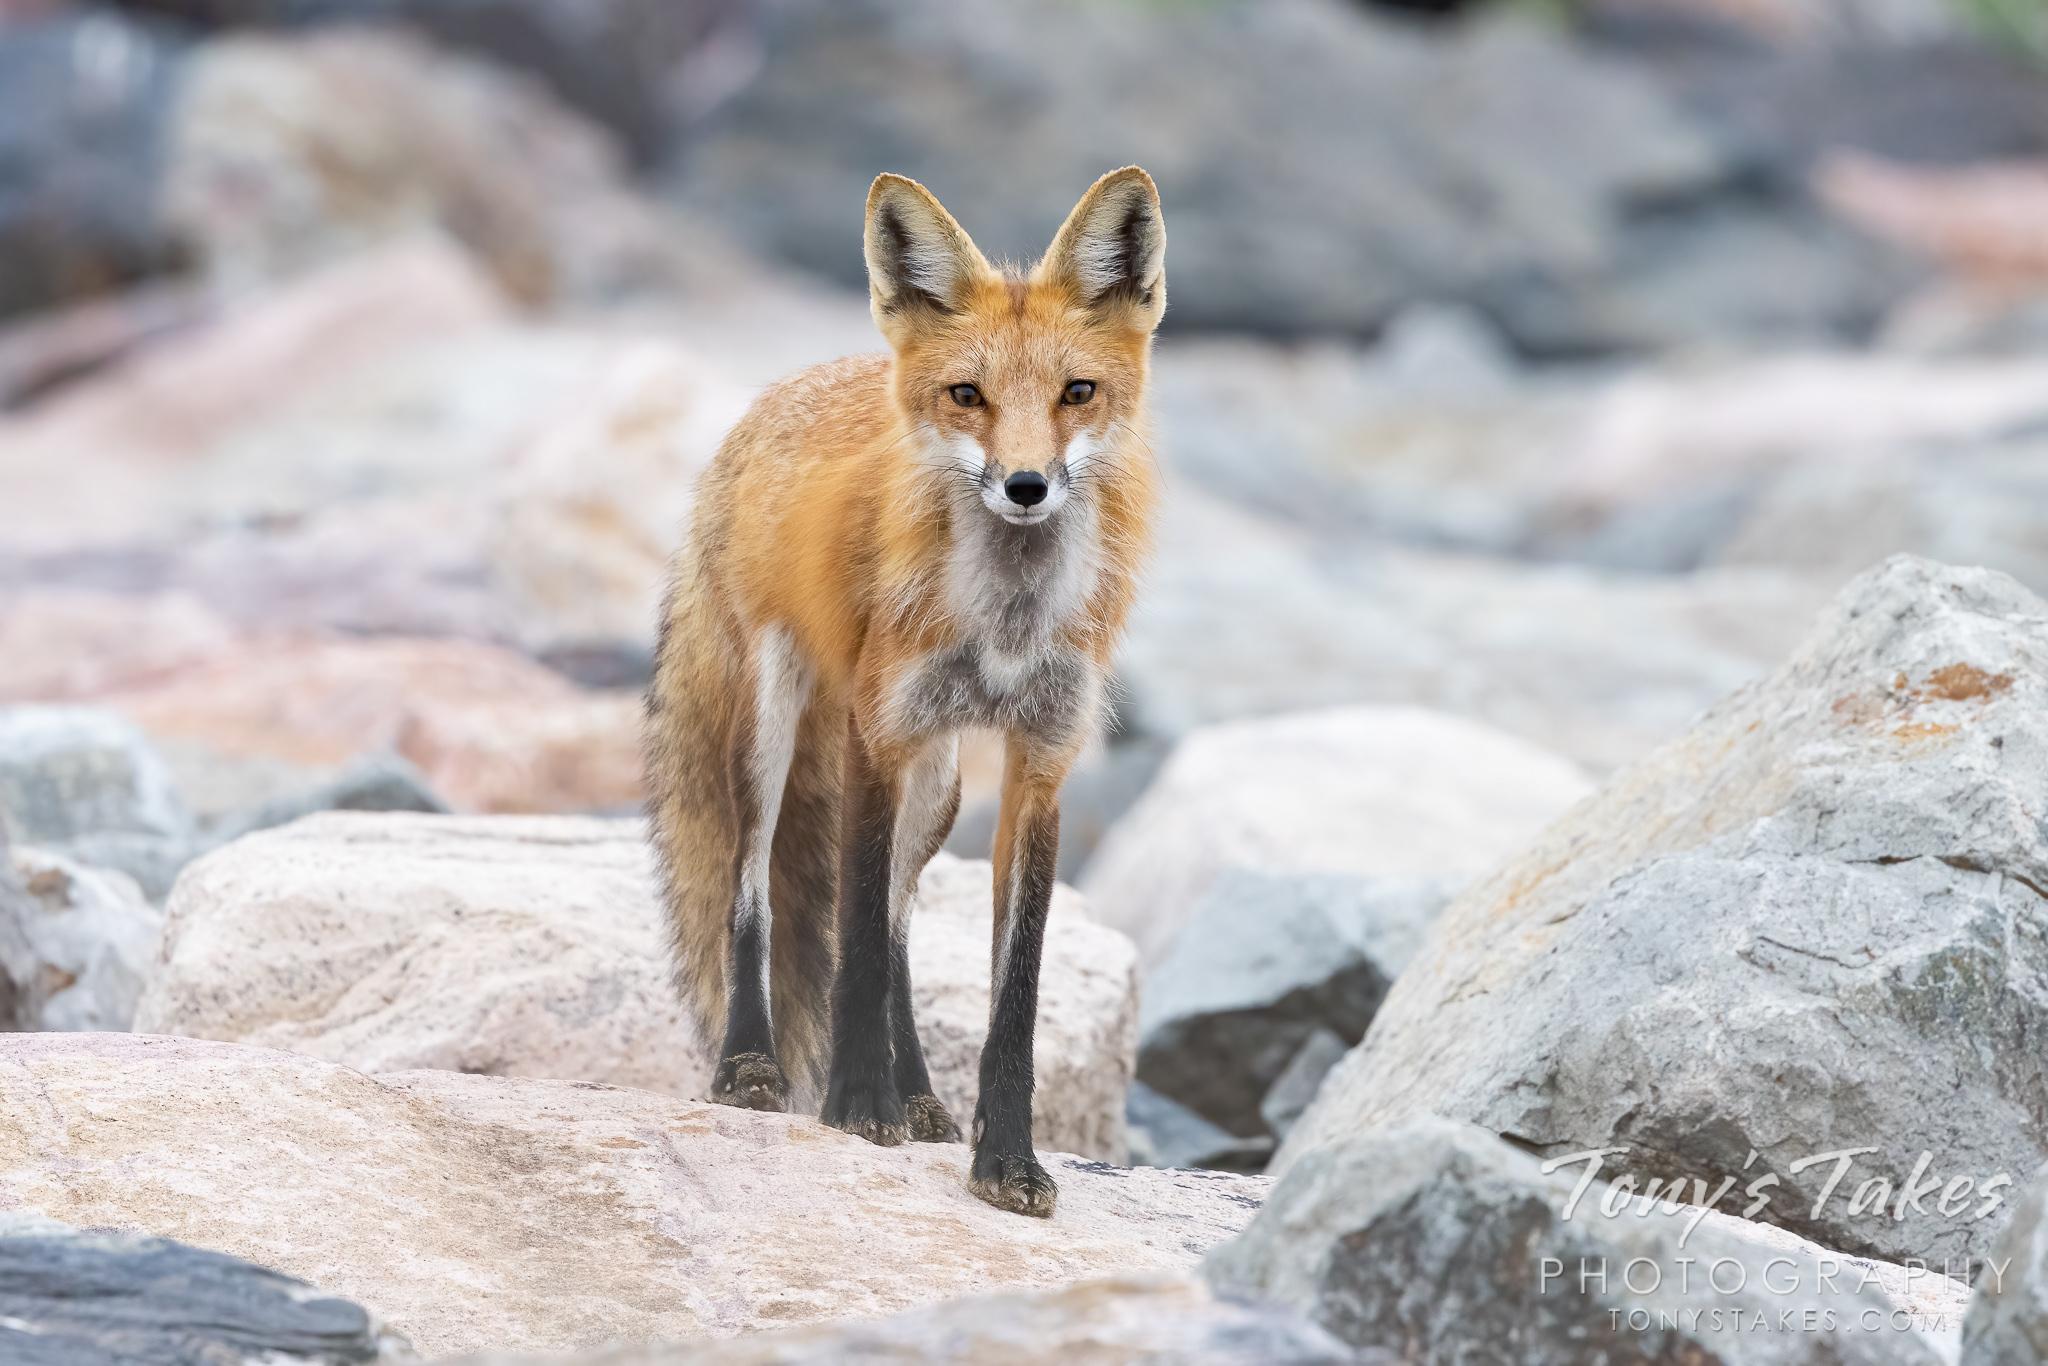 Fox on the rocks for Fox Friday